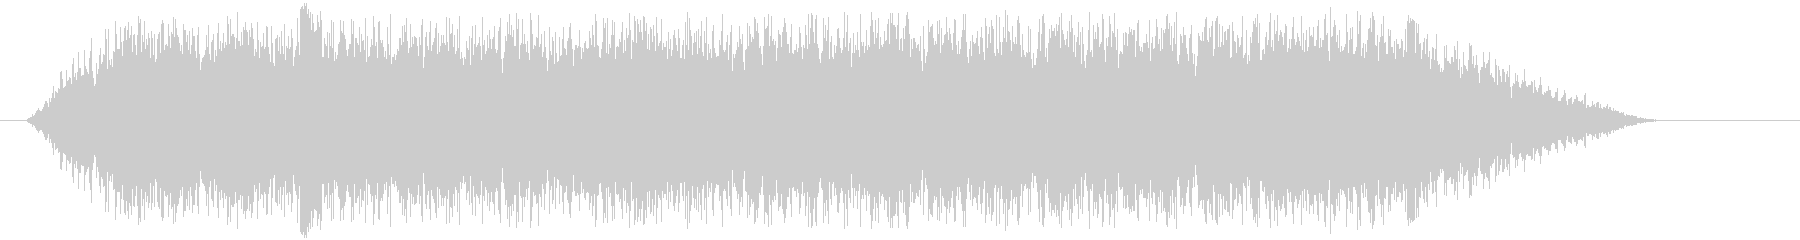 Bus騒-アニメーション-スペインの未再生の波形